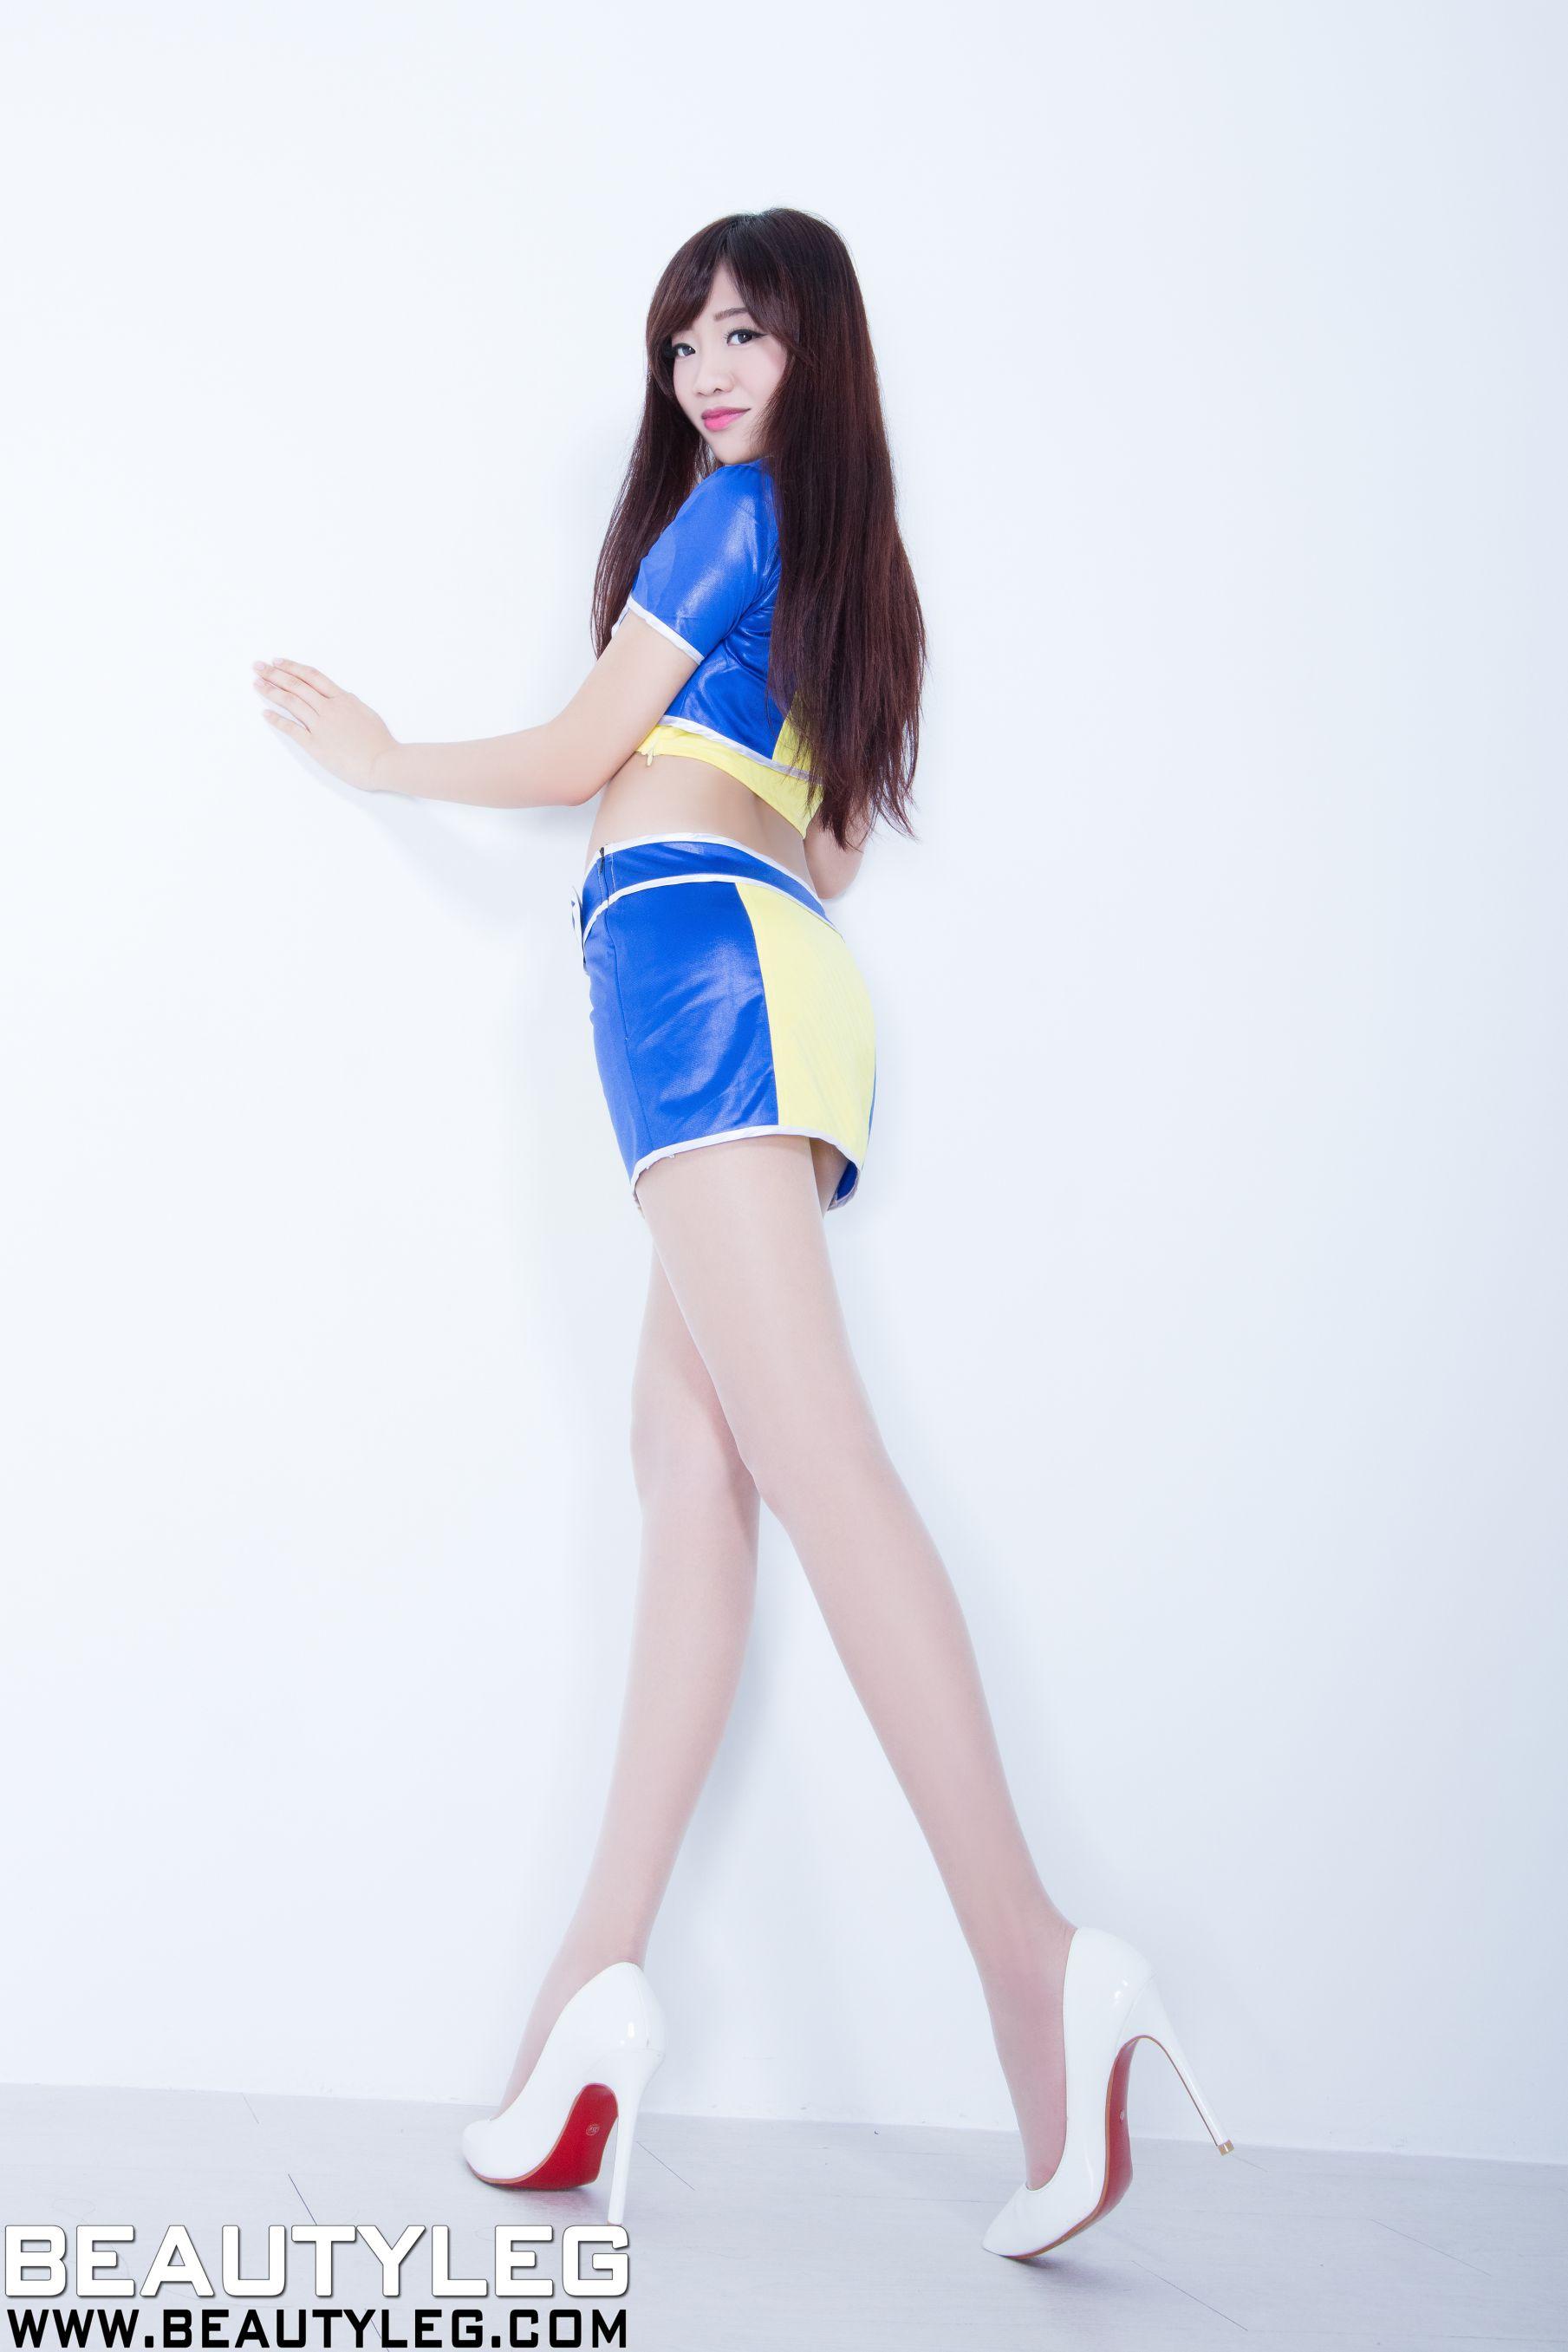 VOL.1270 [Beautyleg]高跟美腿:欣洁(腿模Celia)高品质写真套图(54P)